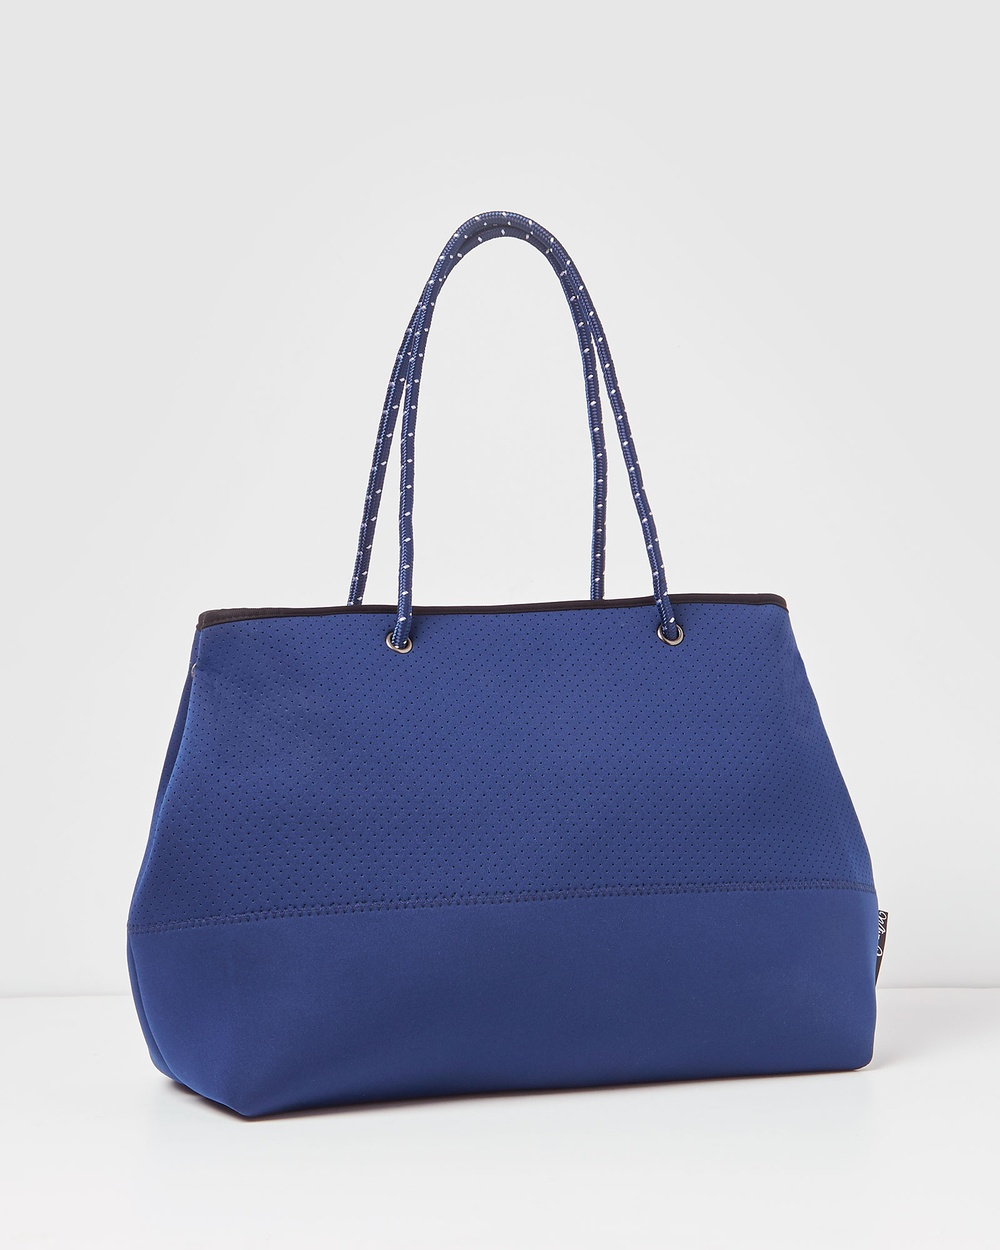 Miz Casa and Co Ivy Neoprene Tote Bag Bags Navy Blue